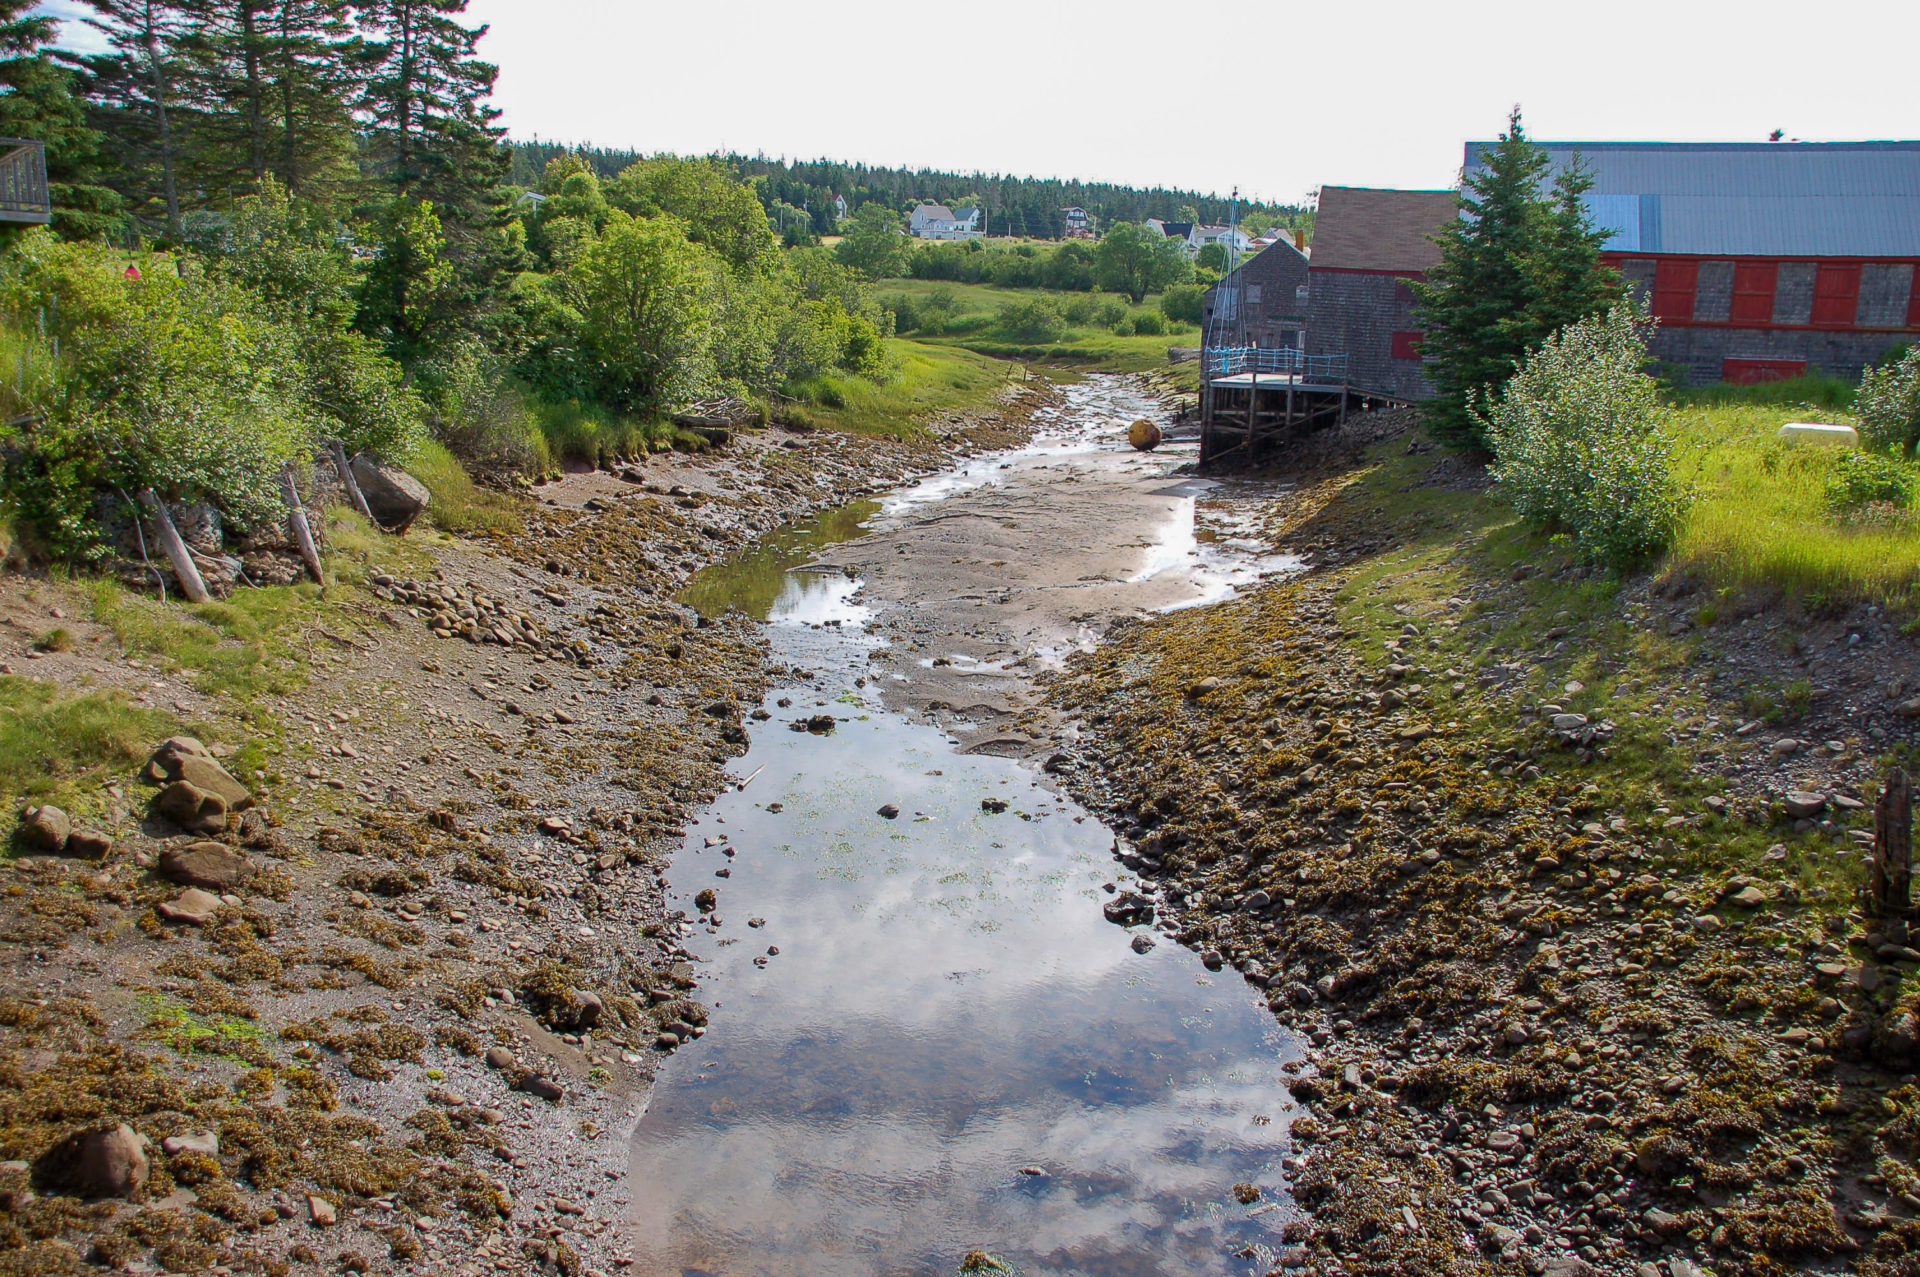 Ein Flussbett bei Ebbe in New Brunswick in Kanada